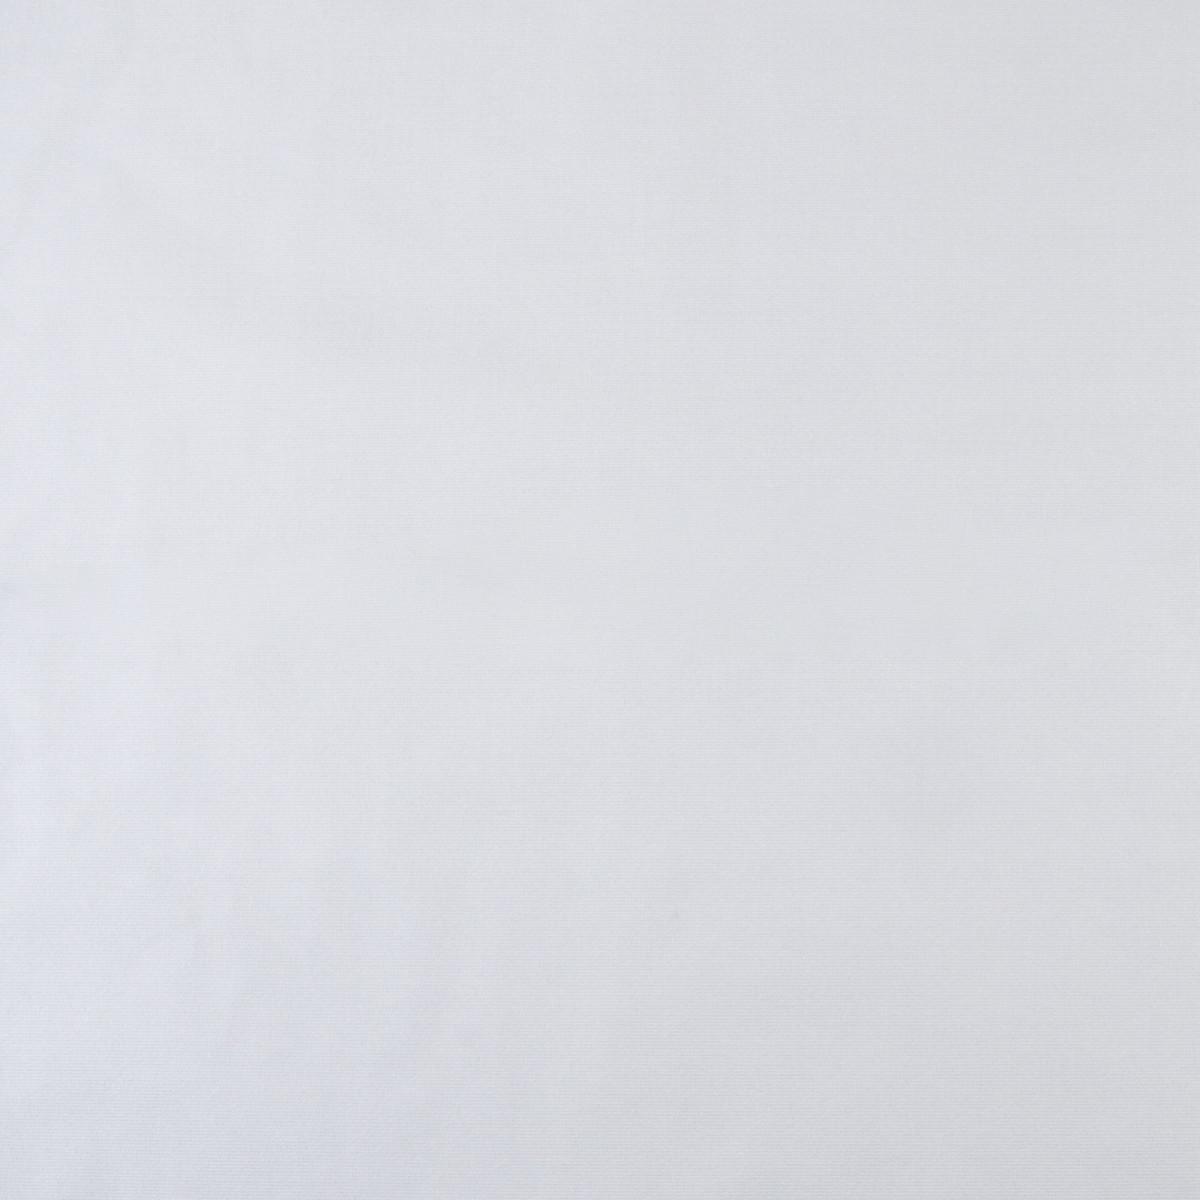 Обои на флизелиновой основе 1.06х10 м однотон цвет серый Эр 2911-5